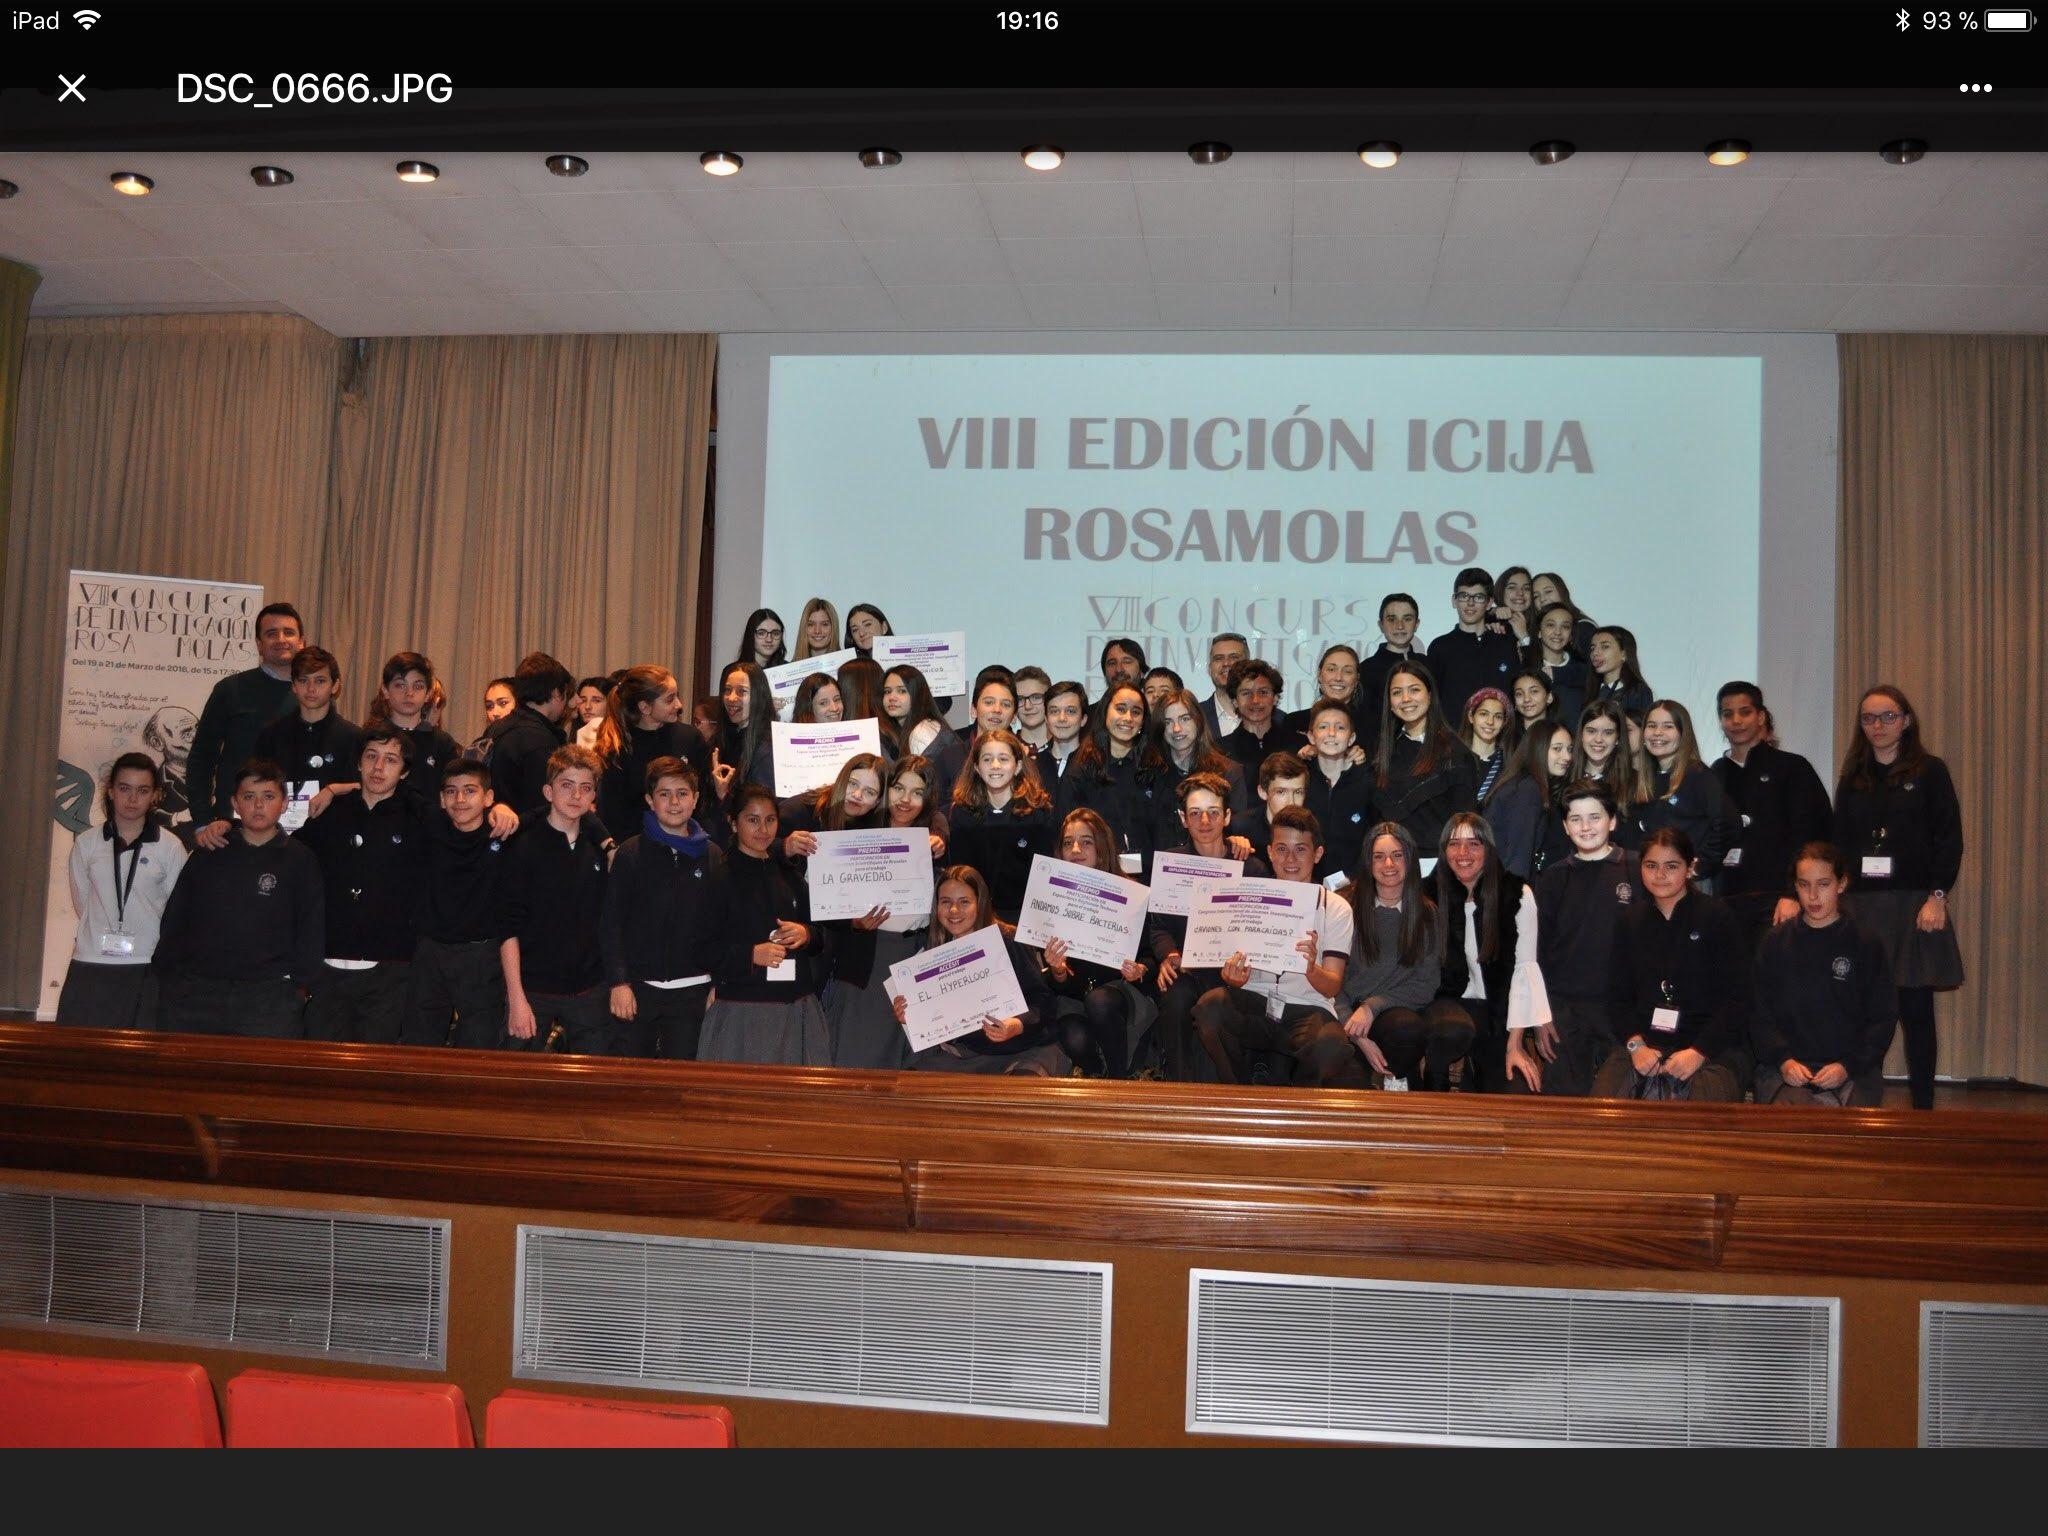 Concurso Rosa Molas 2018